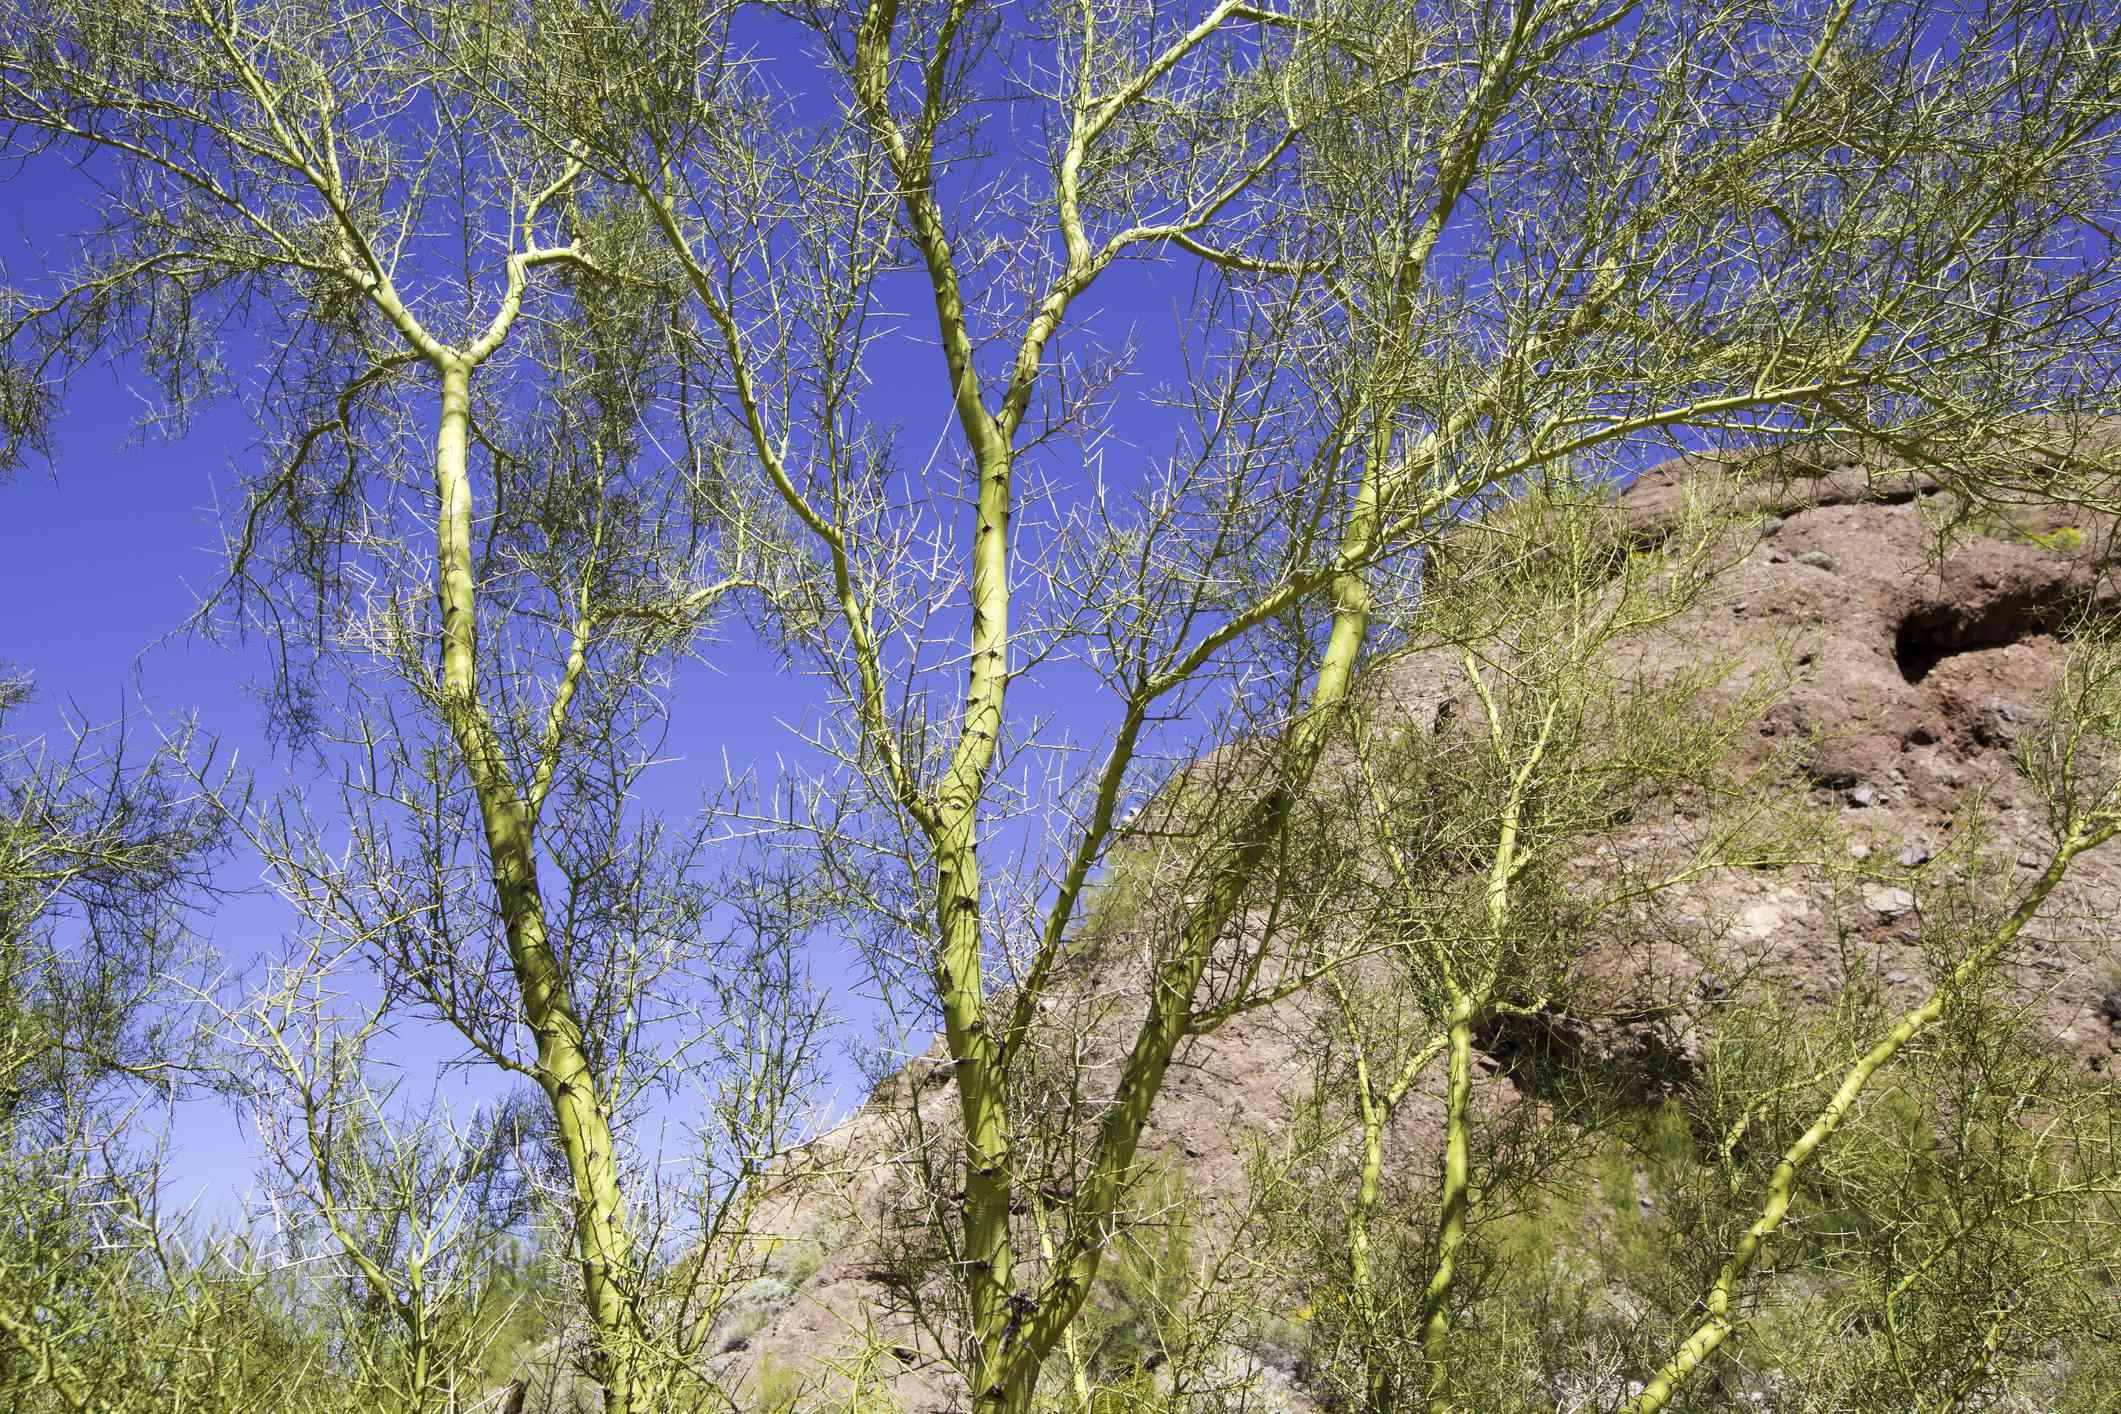 Foothill palo verde (Cercidium microphyllum)